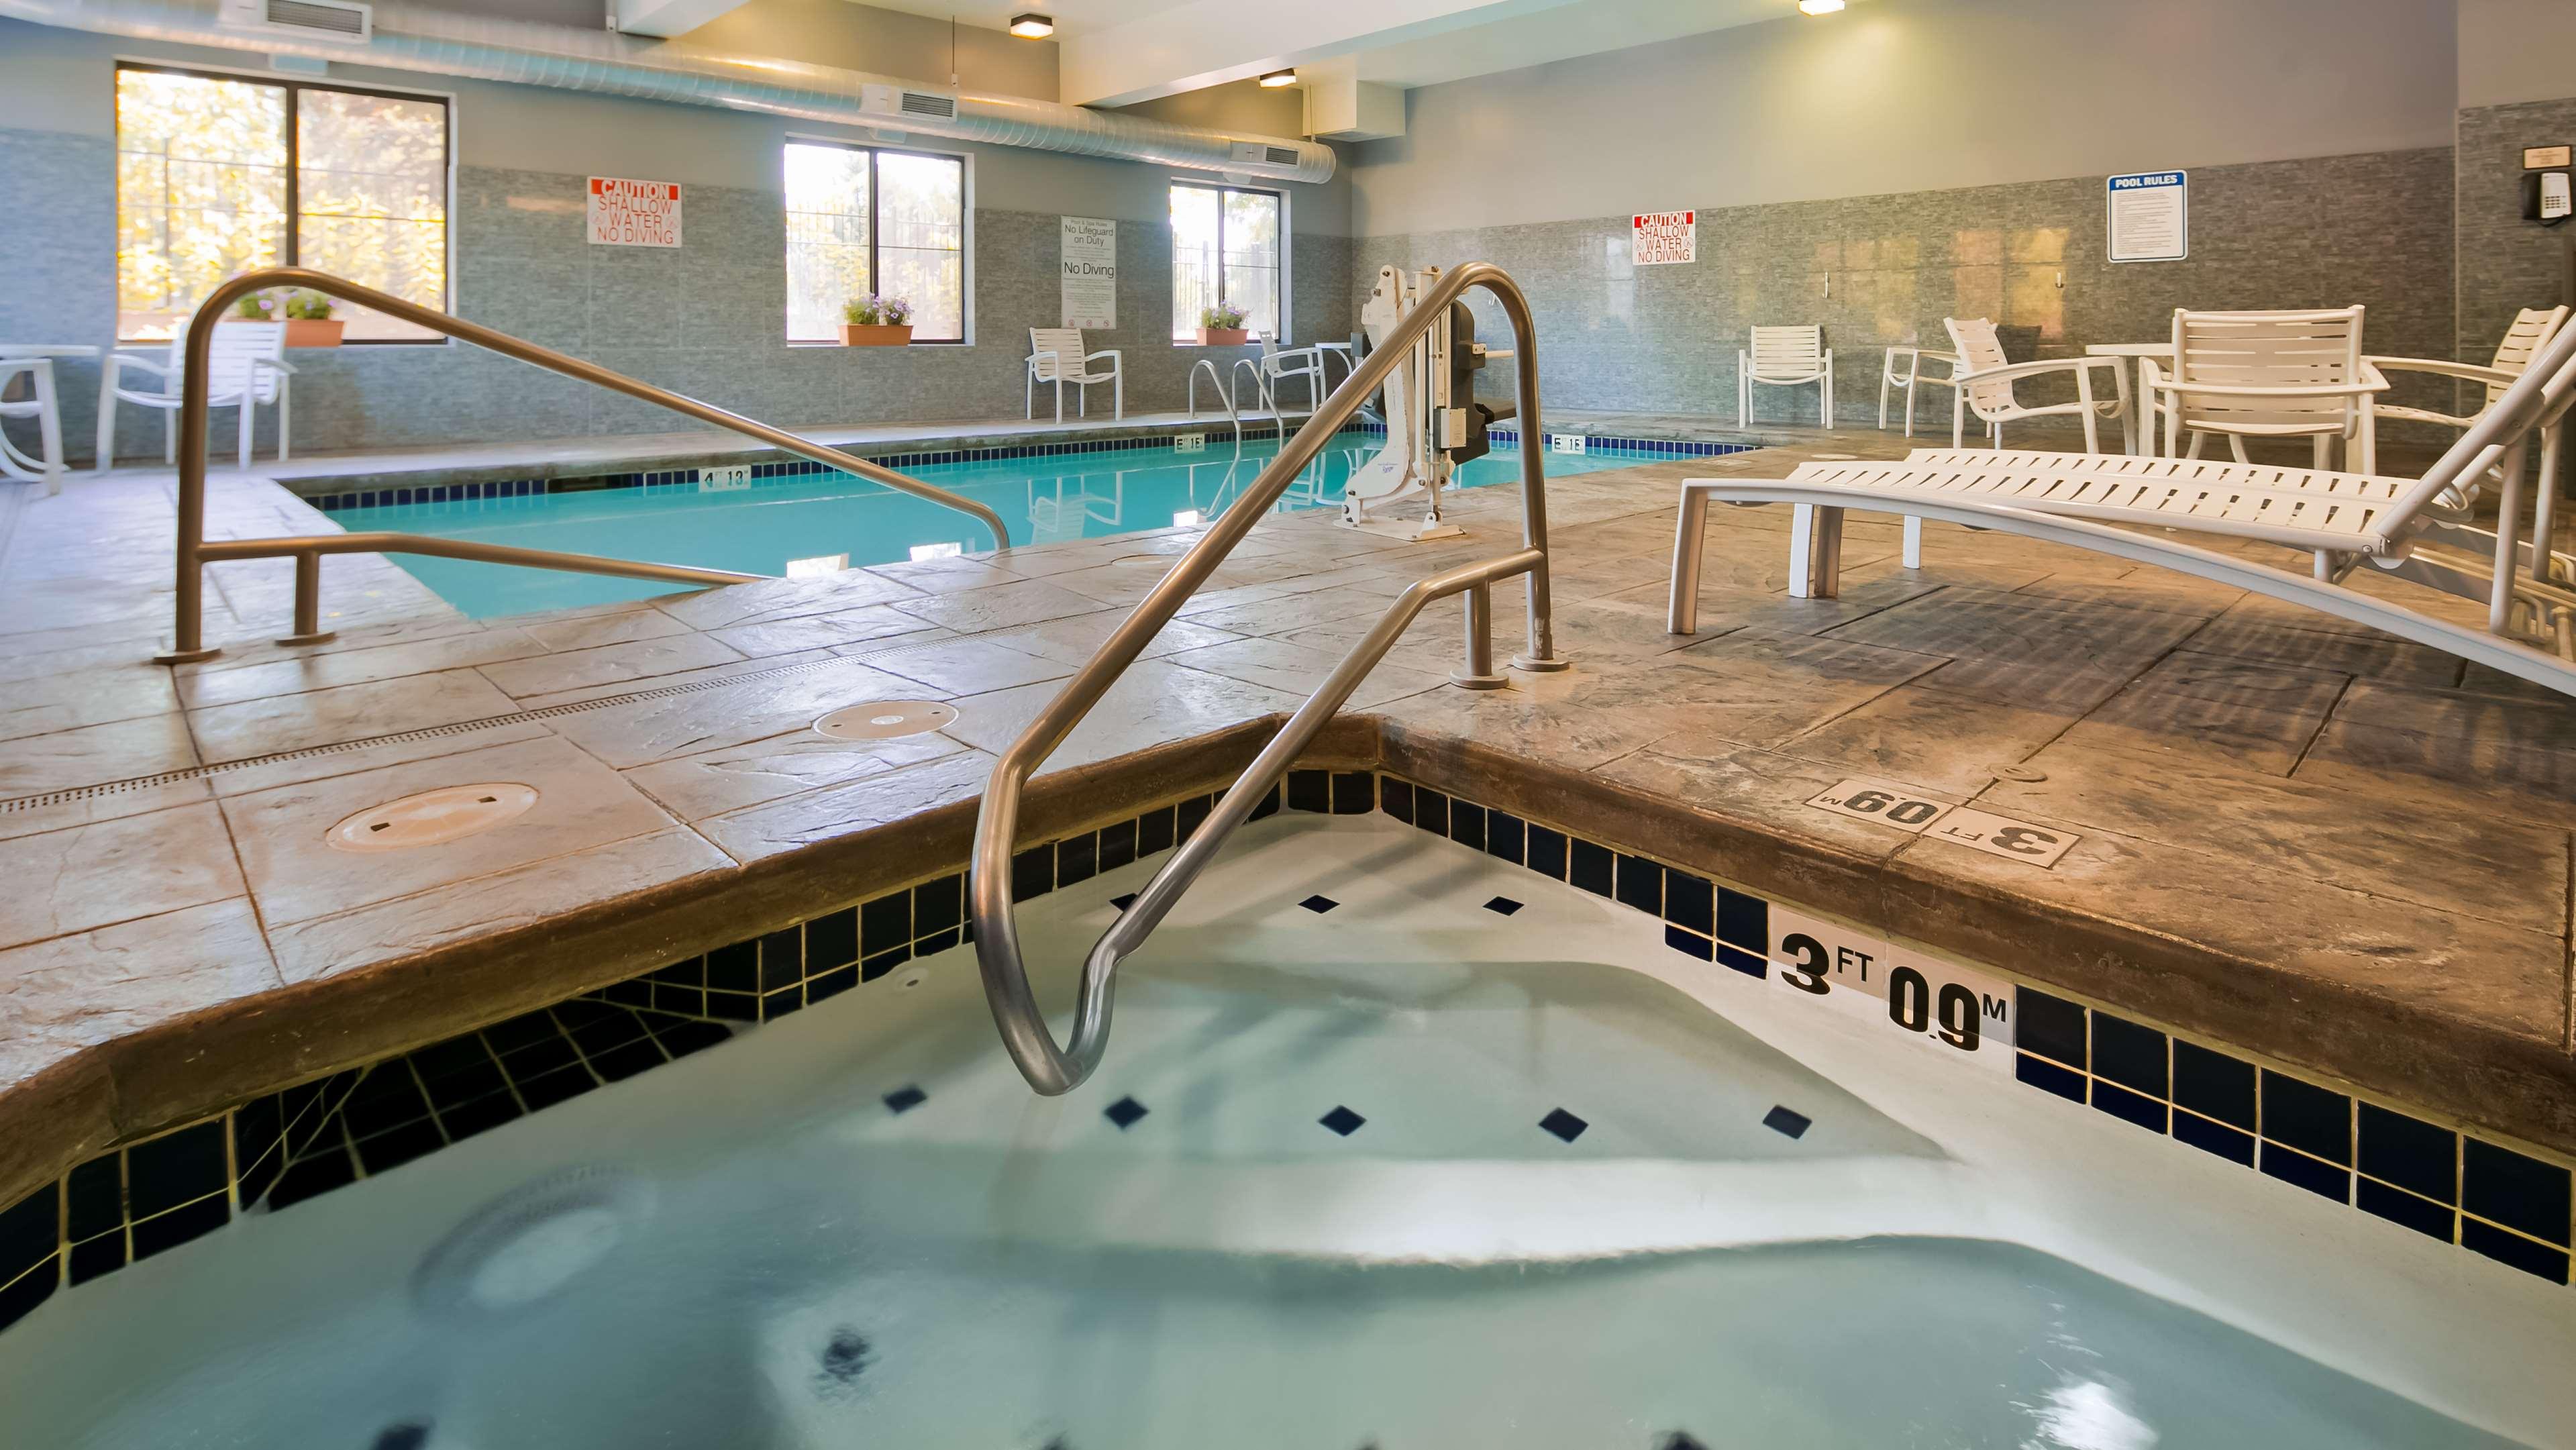 Best Western Plus Lacey Inn & Suites image 3